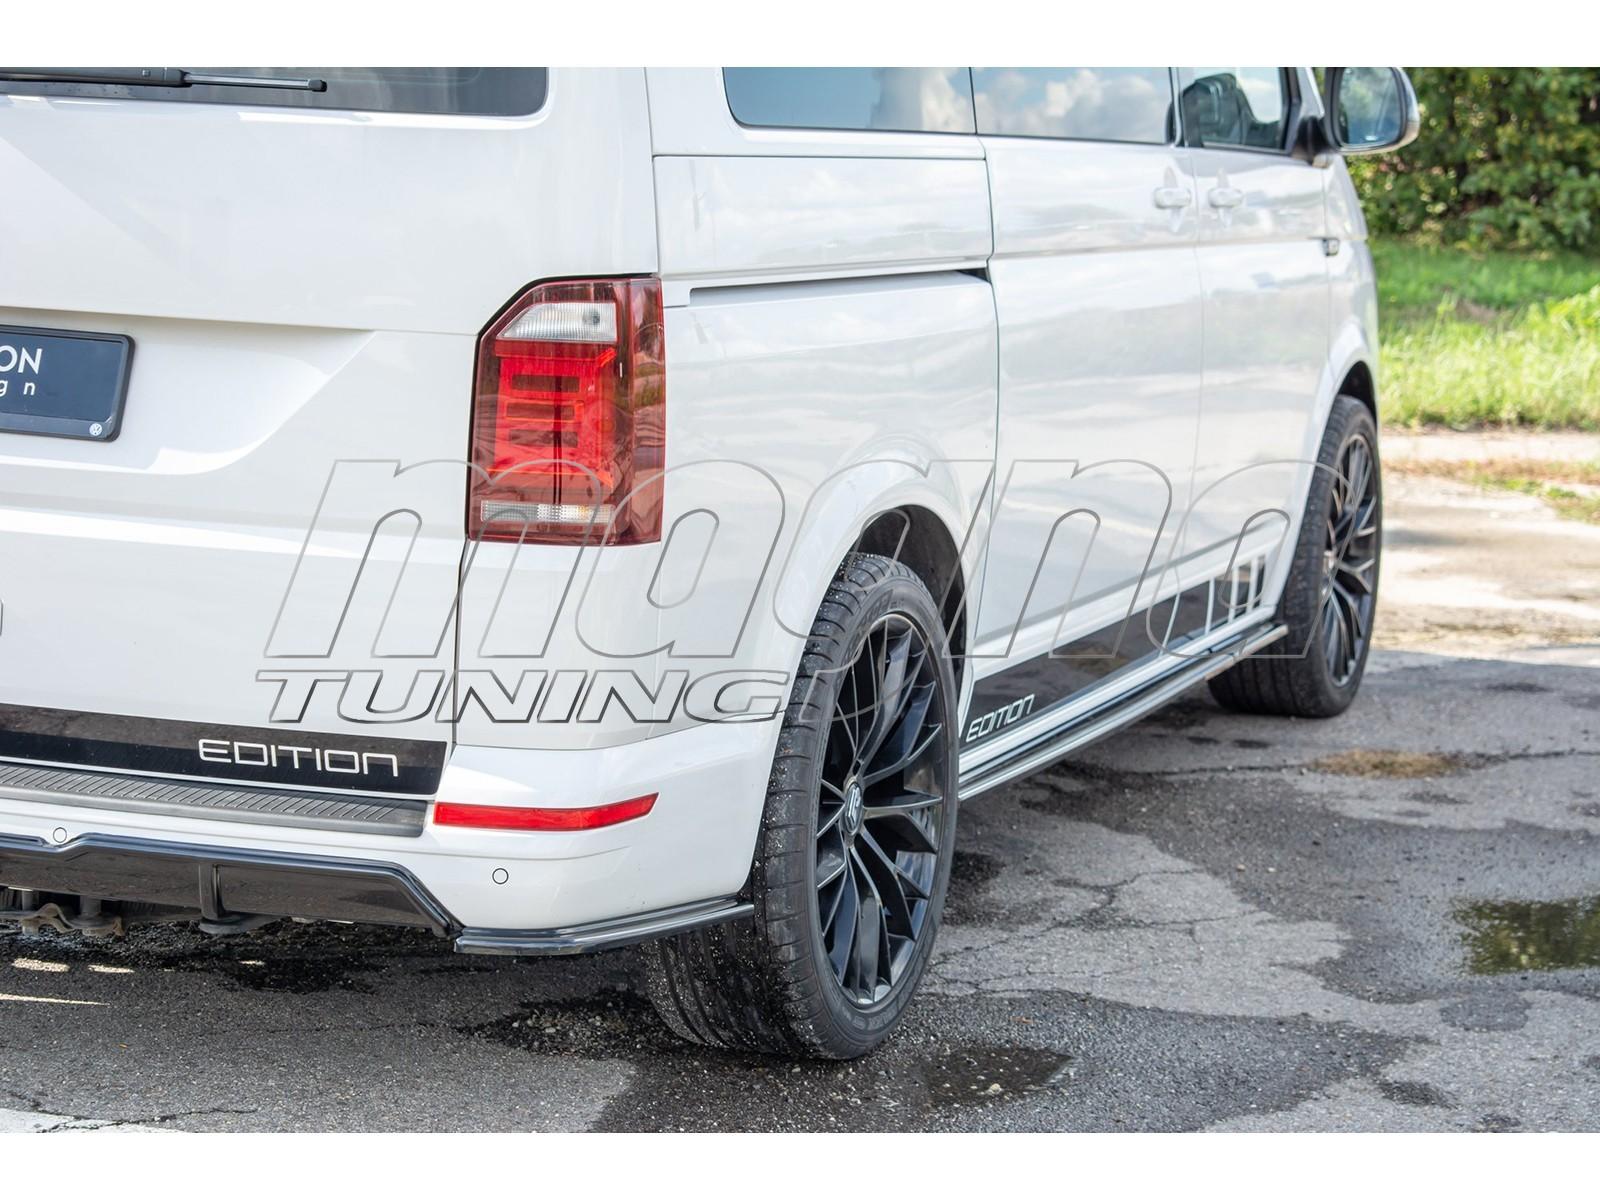 VW Transporter T6 Maximus Rear Bumper Extension